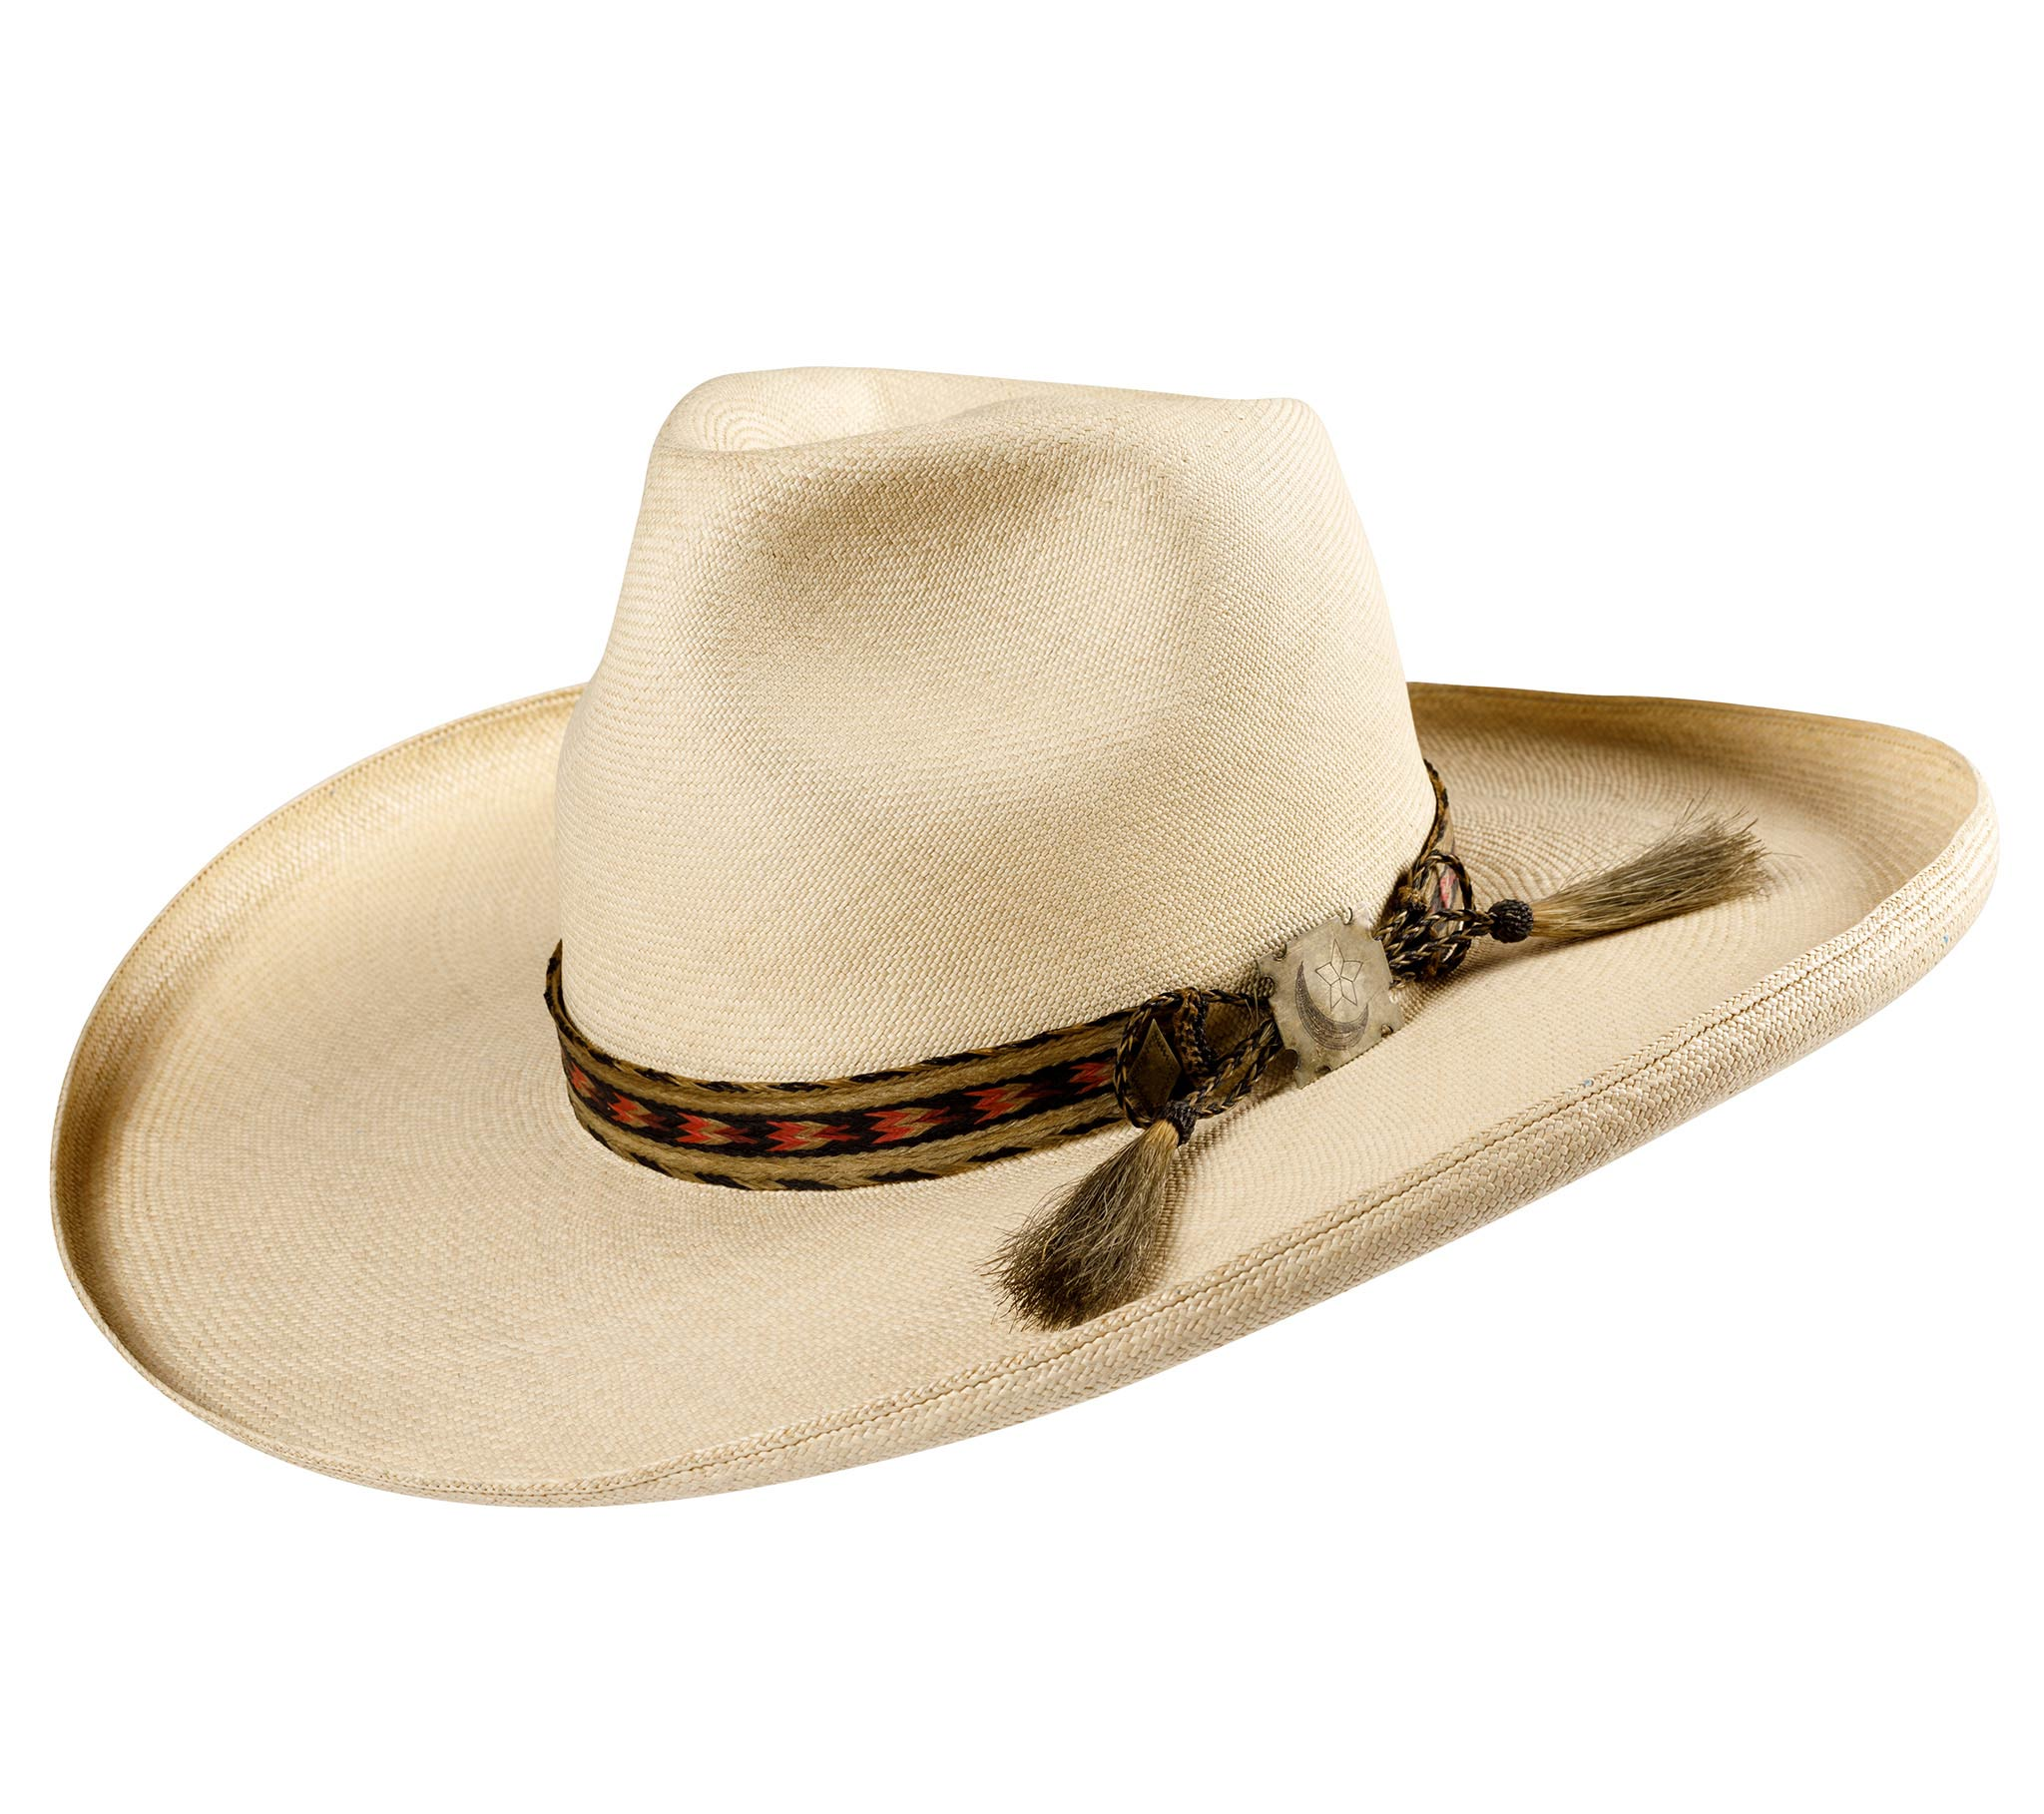 Troublemaker Panama Hat